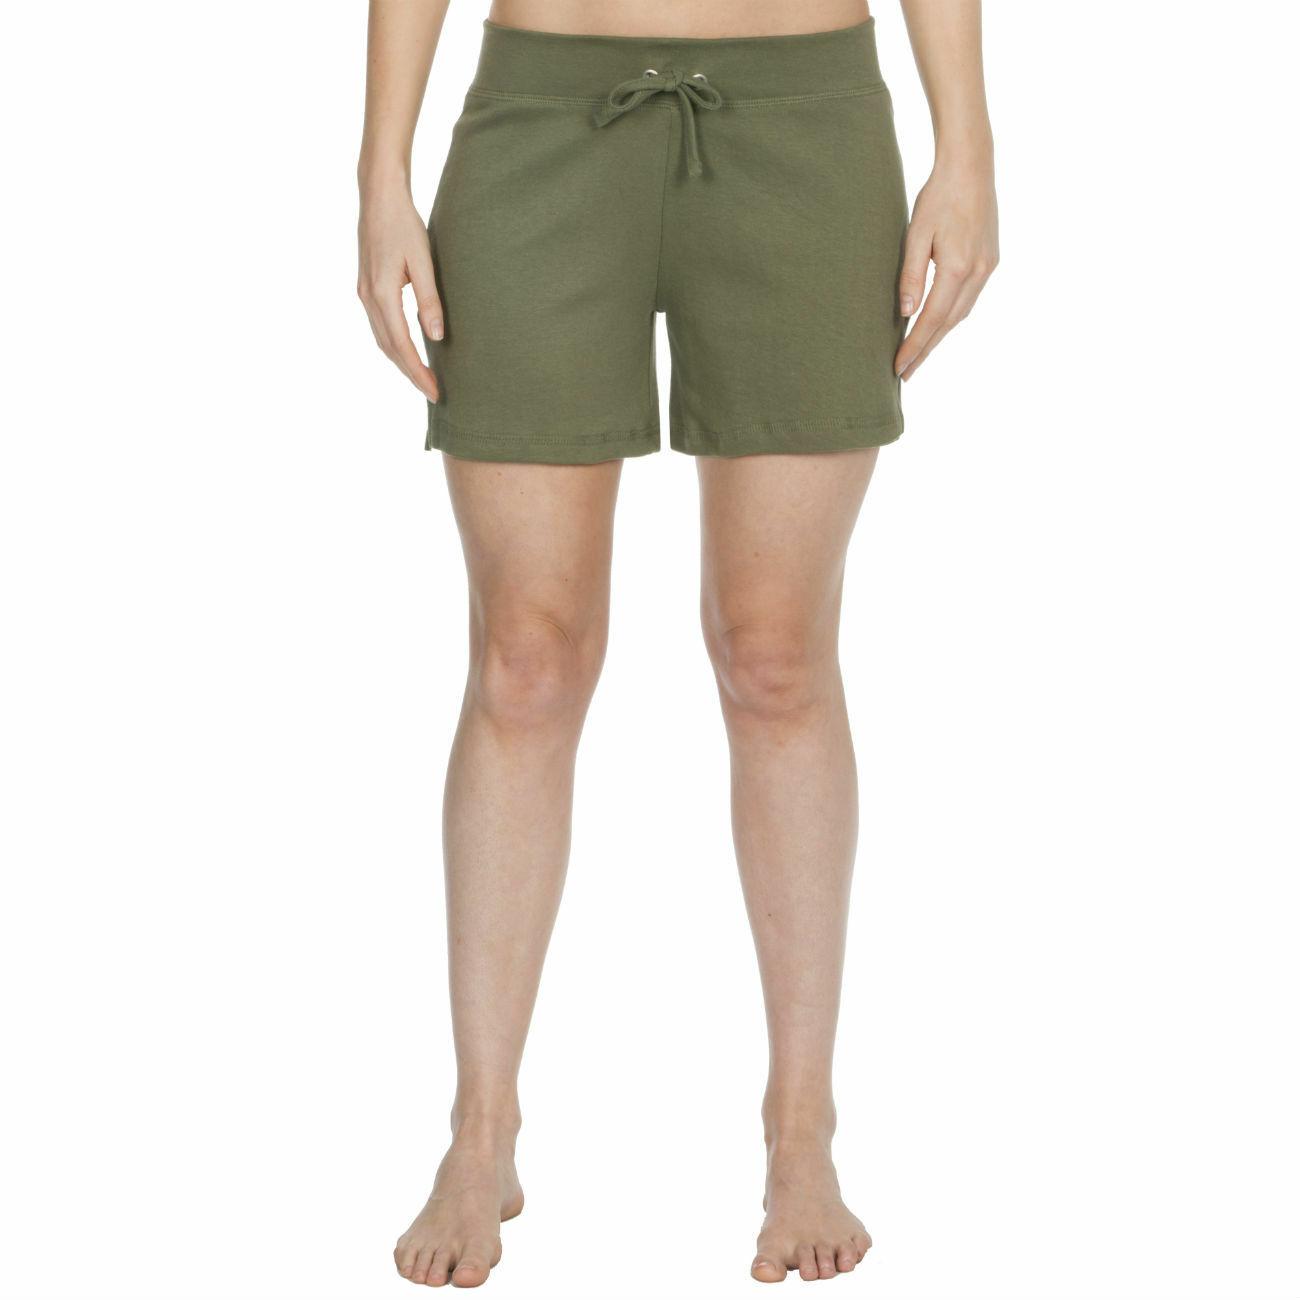 Womens-Cotton-Jersey-Shorts-Elastic-Waist-Summer-Beach-Casual-Yoga-Hot-Pants-New thumbnail 20